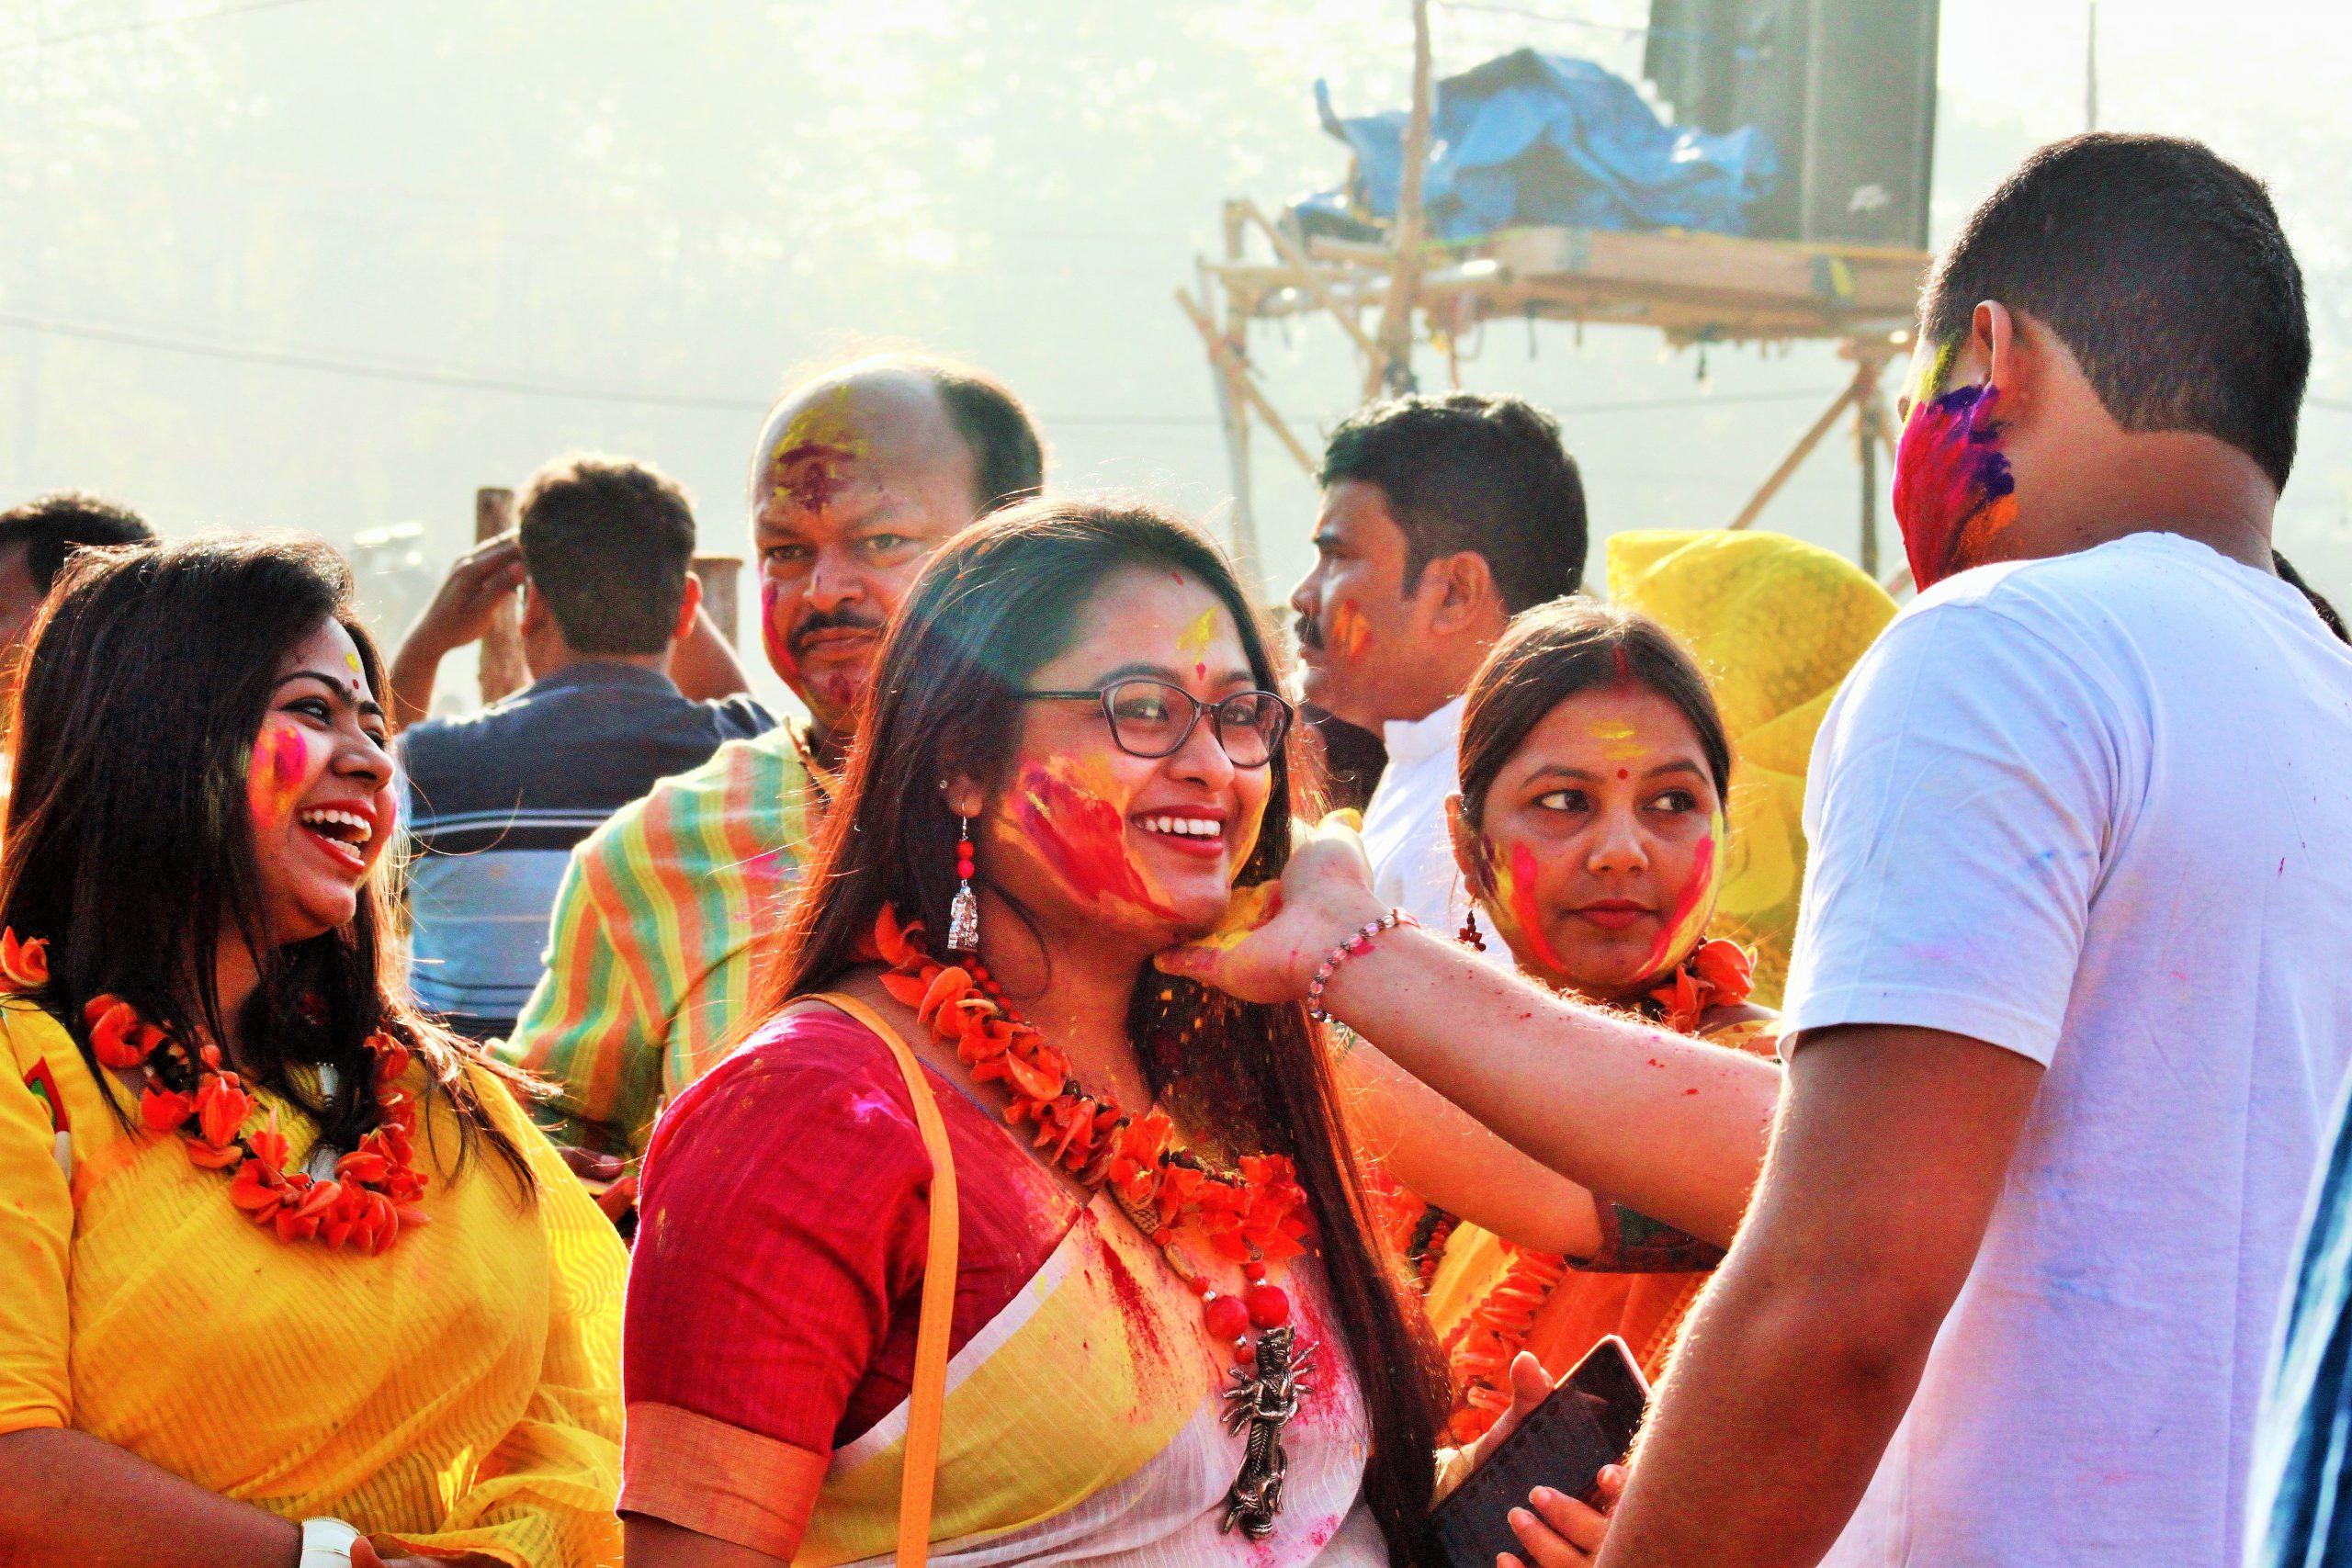 People celebrating Holi festival